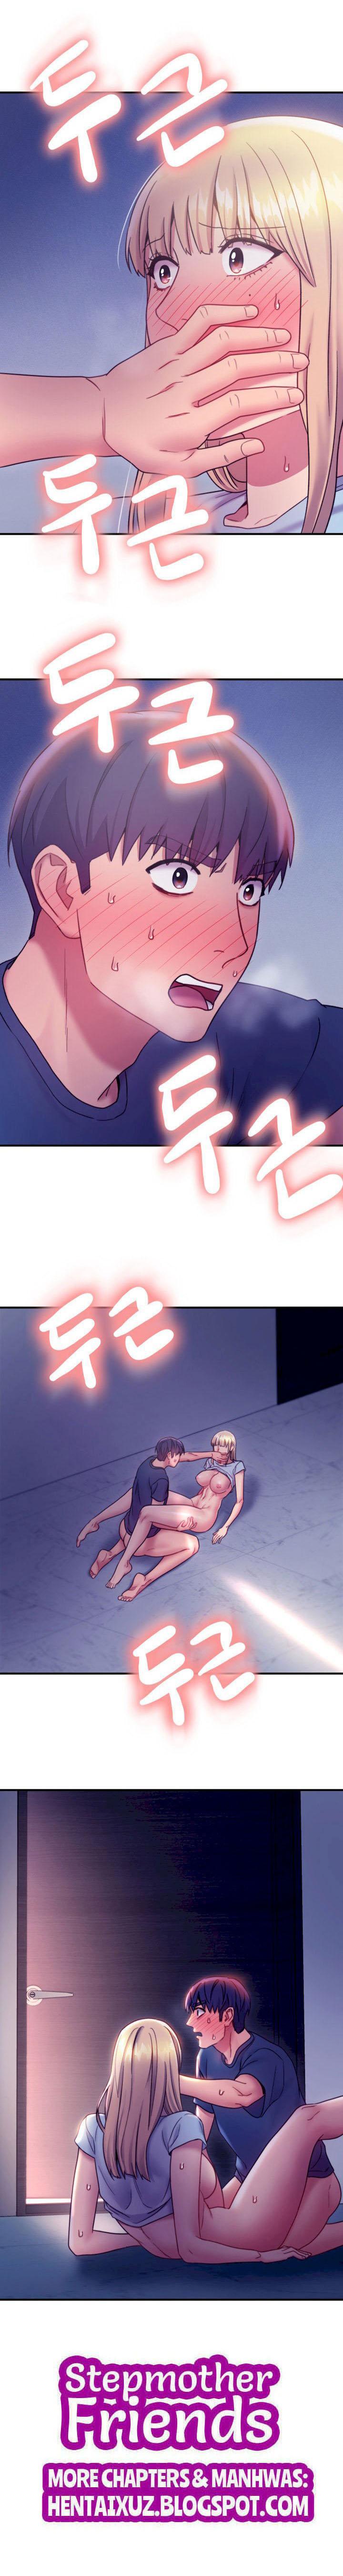 [Neck Pilllow] Stepmother Friends Ch.39/? [English] [Hentai Universe] NEW! 13/10/2020 252